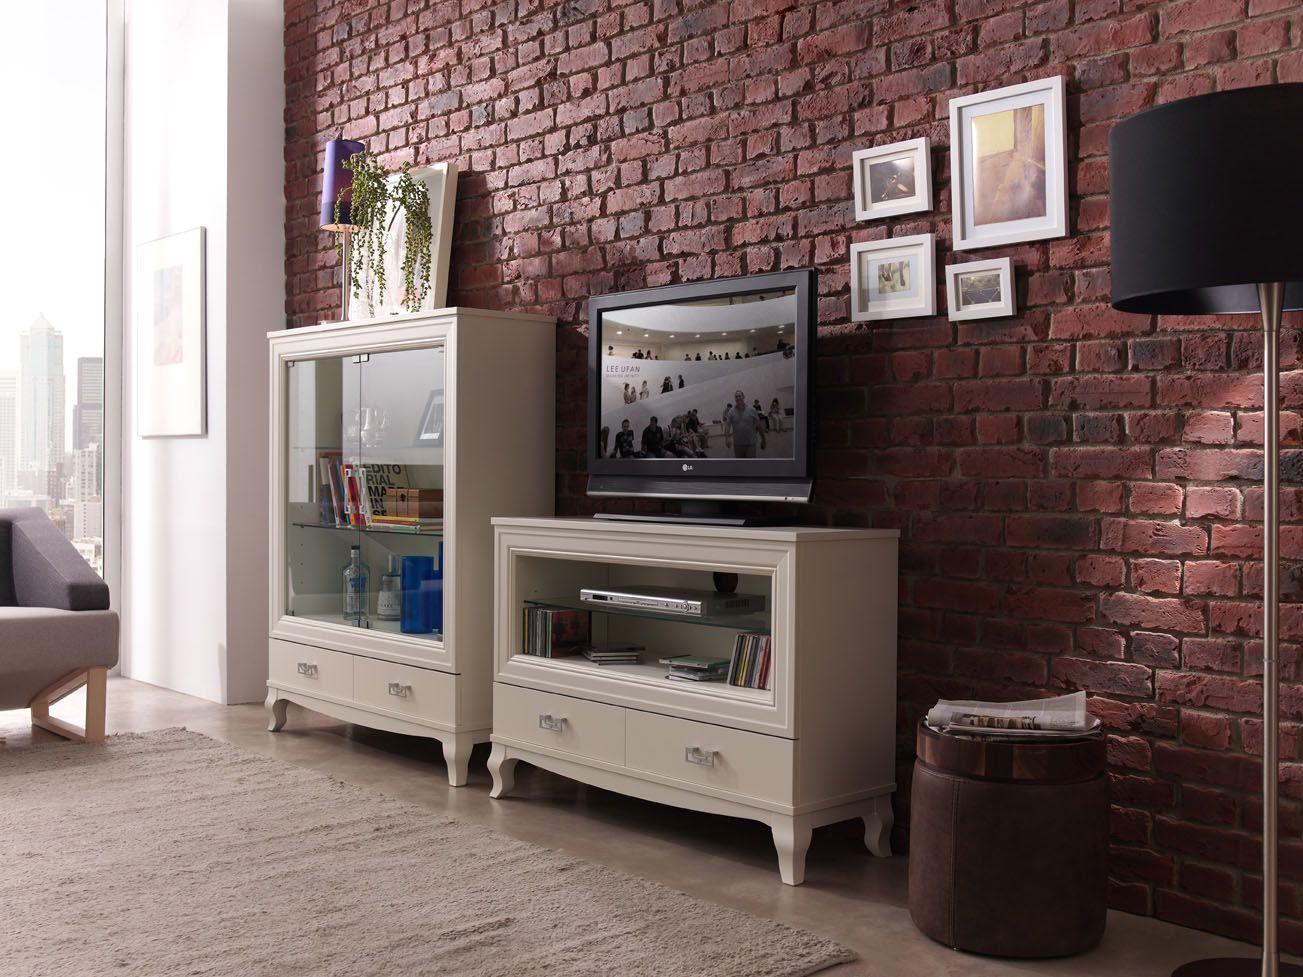 Old British Brick I Ladrillo Viejo Ingles | cava | Pinterest ...